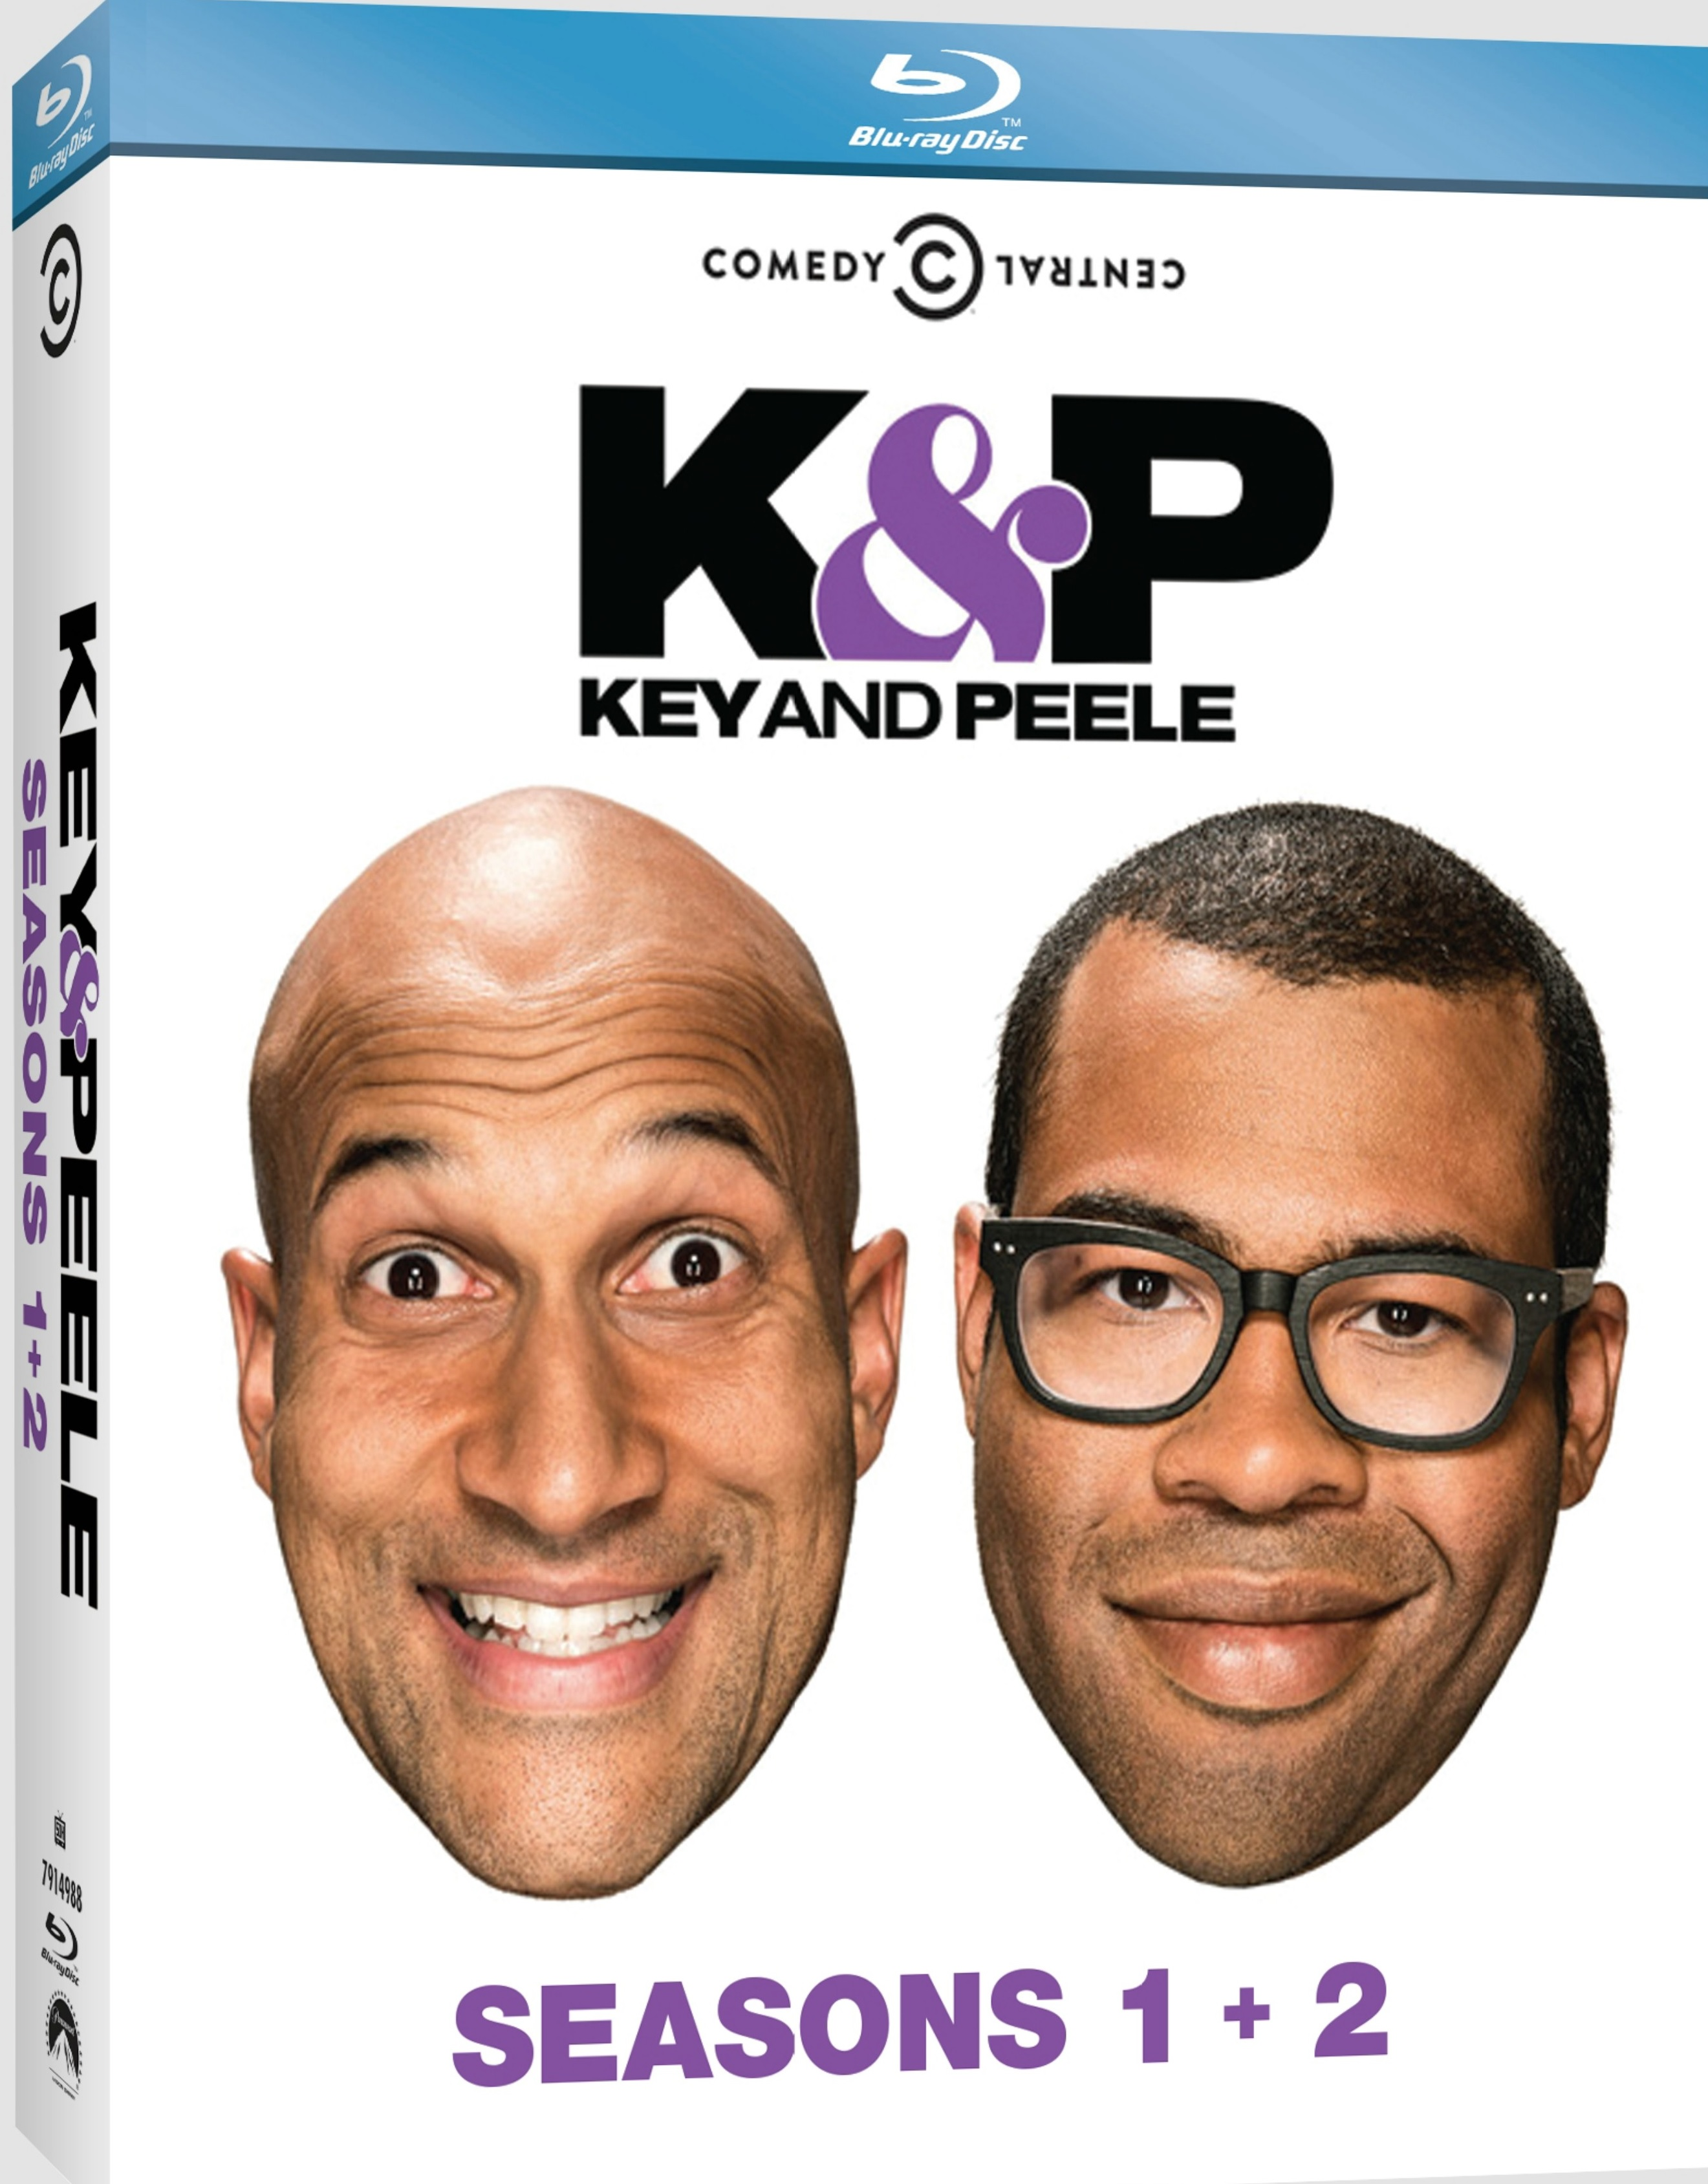 Key and Peele Season 1 & 2 Blu-ray Review